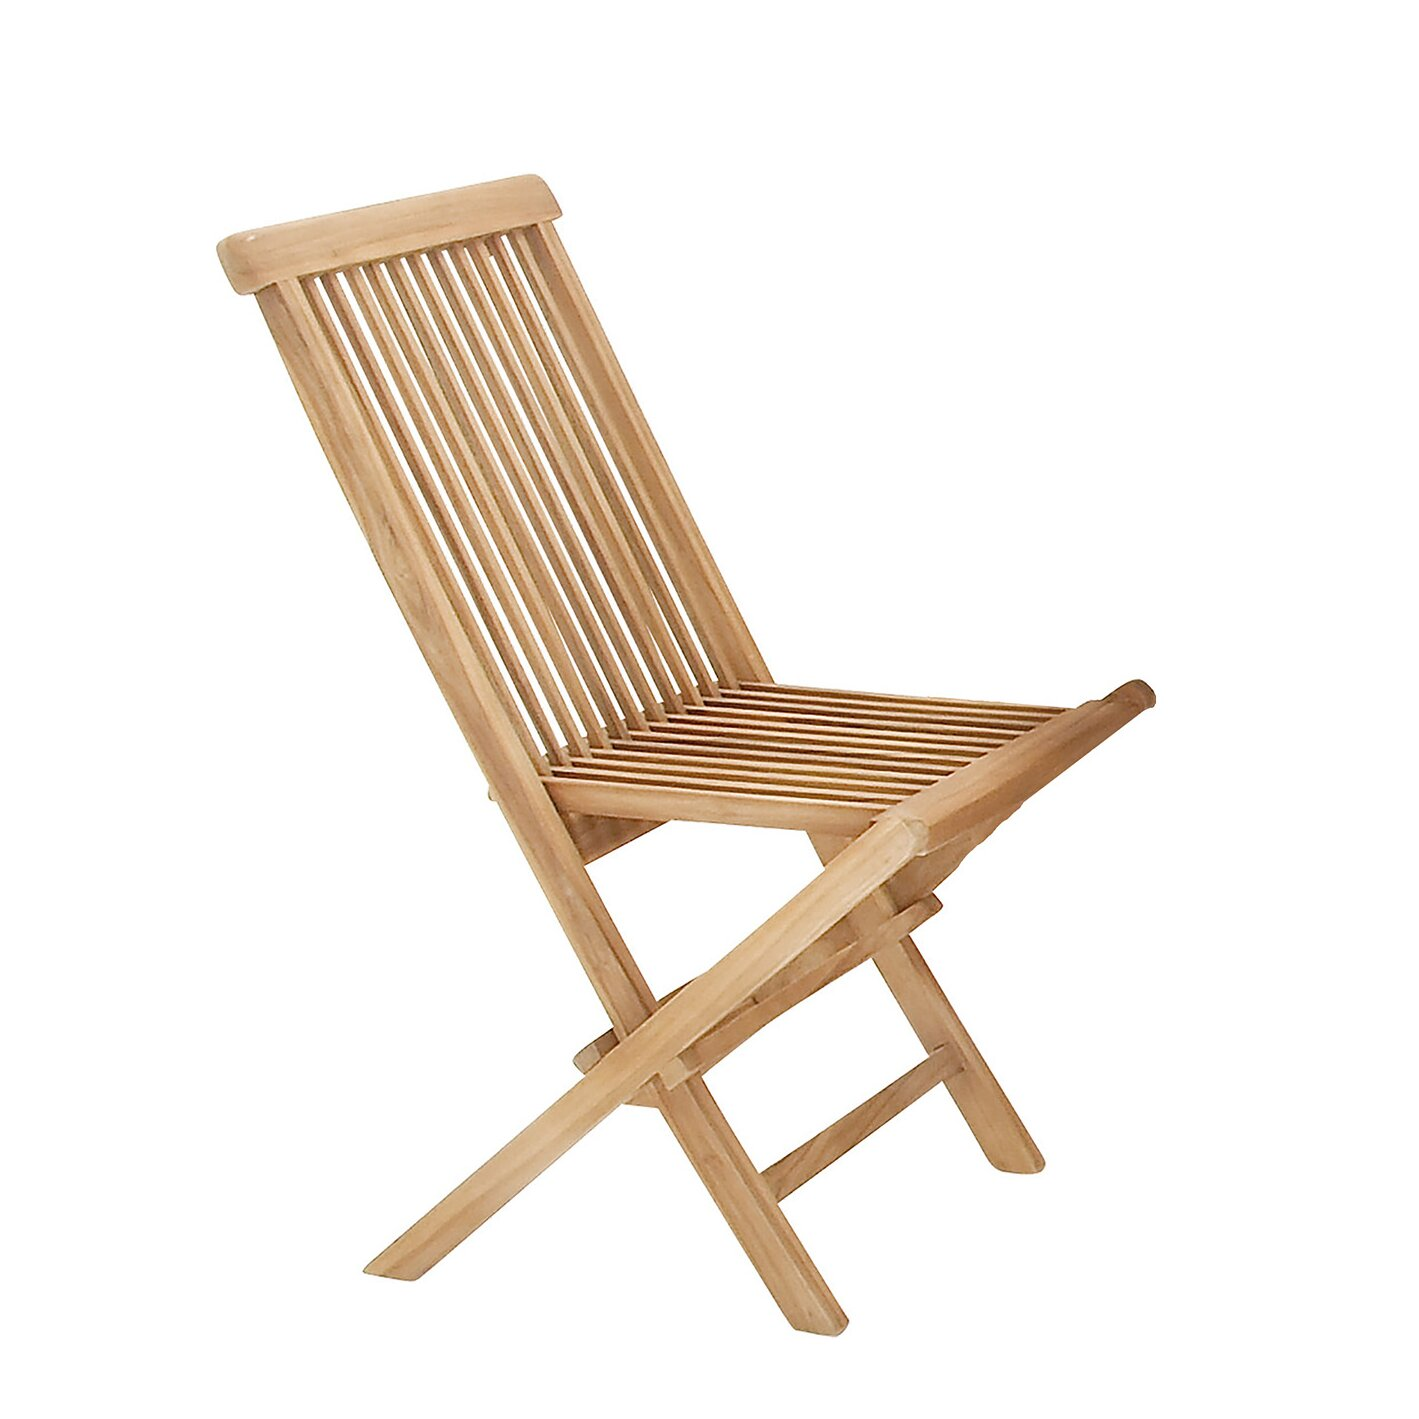 Urban Designs Teak Wood Folding Chair 5 Piece Dining Set